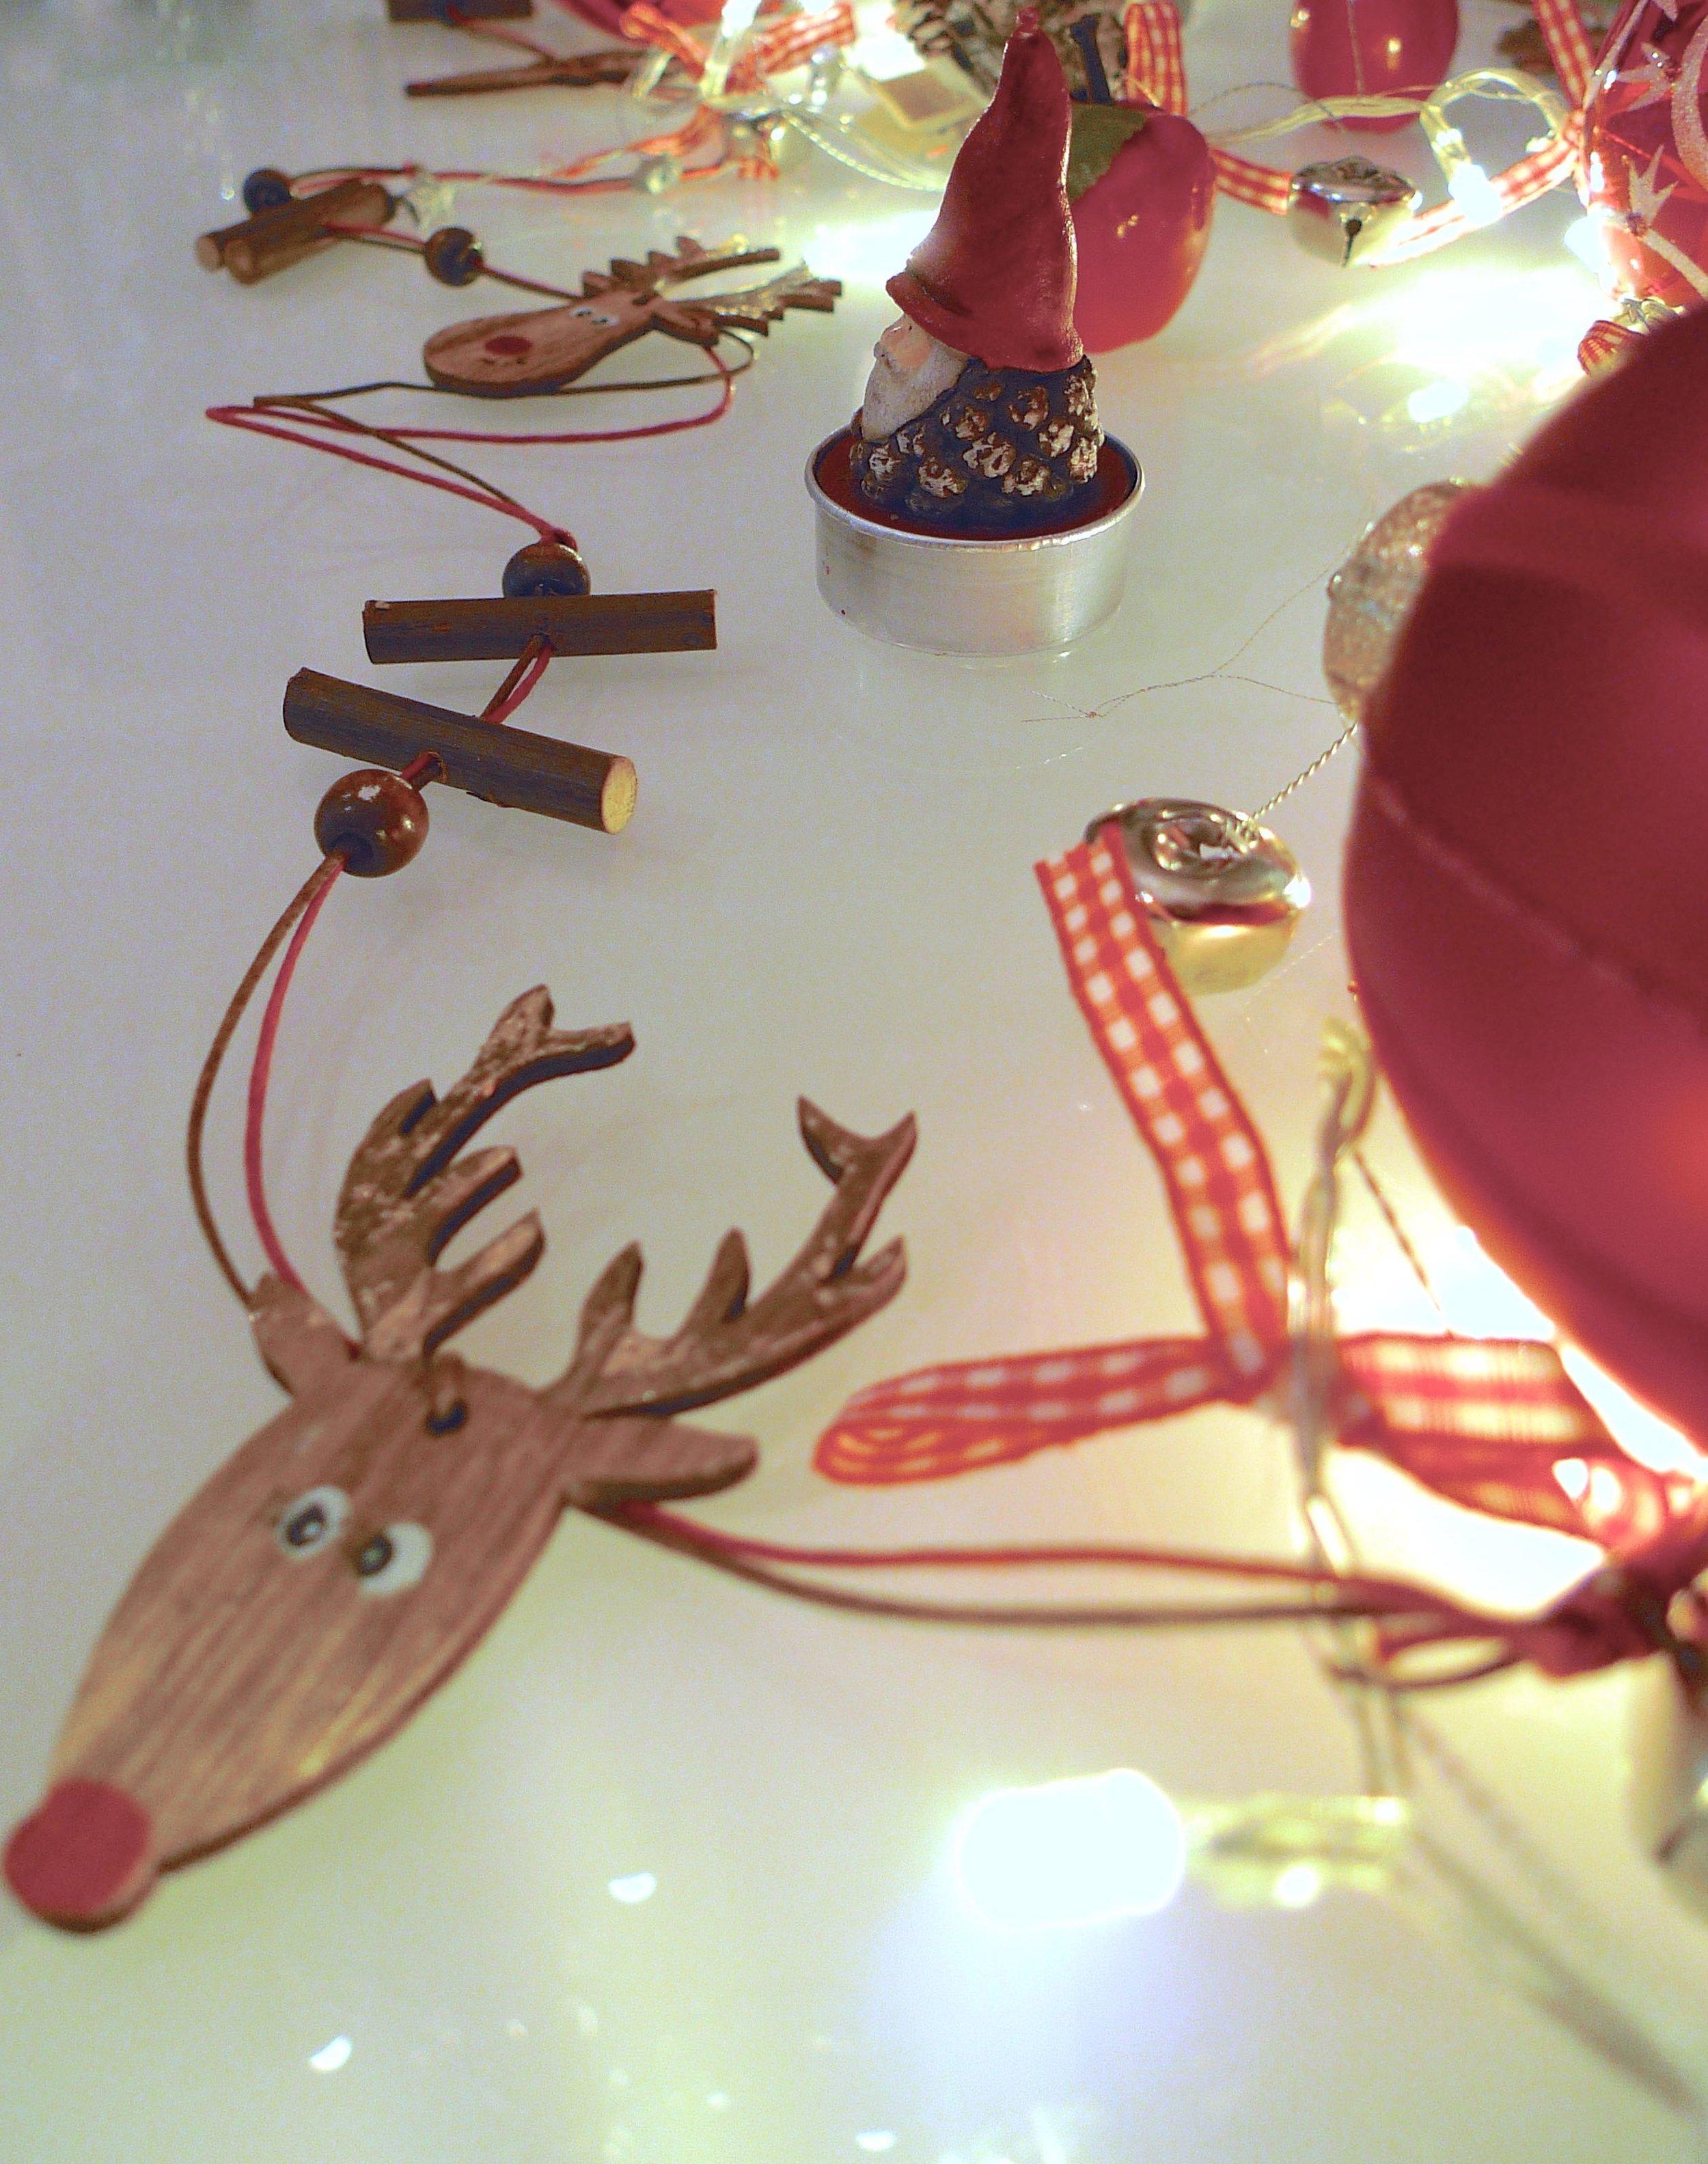 A cheeky reindeer garland among the jingle bell lights from TK Maxx